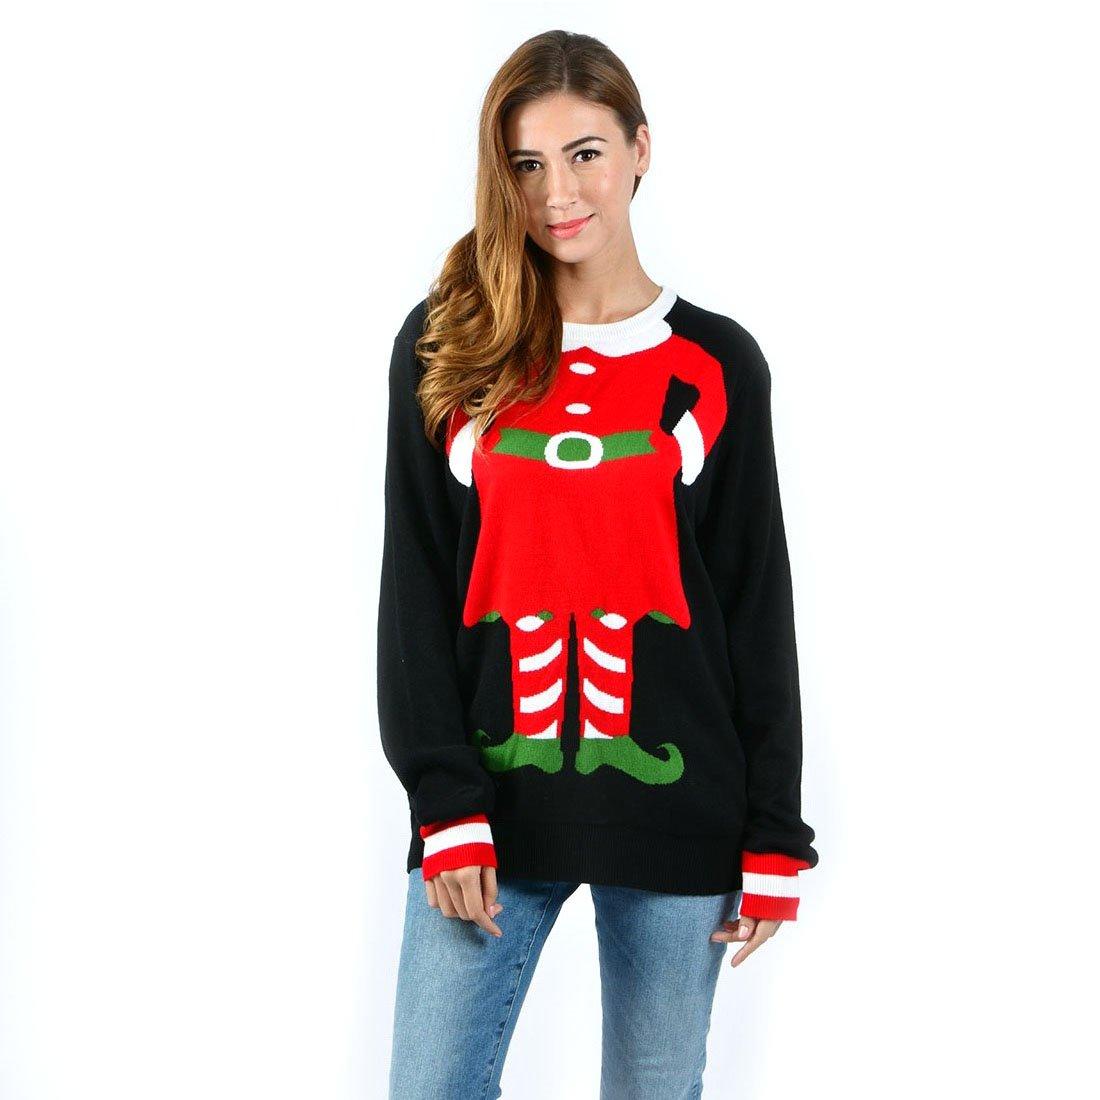 Uideazone Unisex Ugly Christmas Sweaters Long Sleeve Round Neck